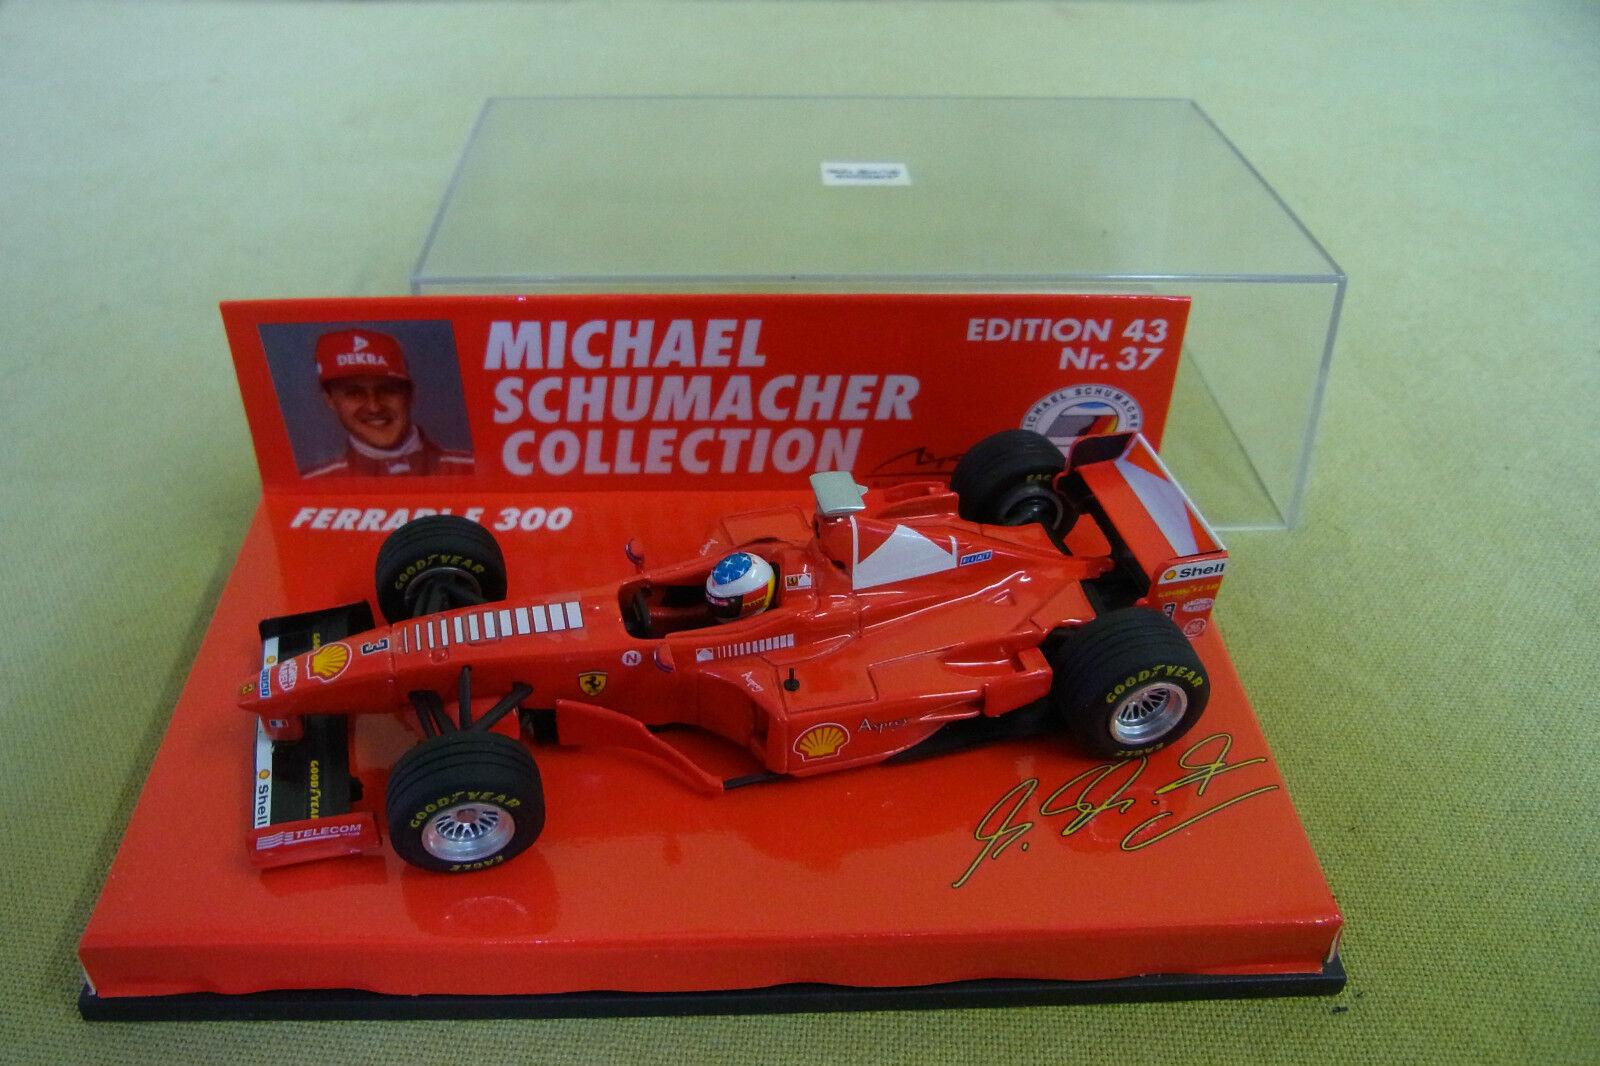 Minichamps - Ferrari F 300 - - - Michael Schumacher Collection - Edition 43 Nr. 37  | Exquisite Verarbeitung  910eed